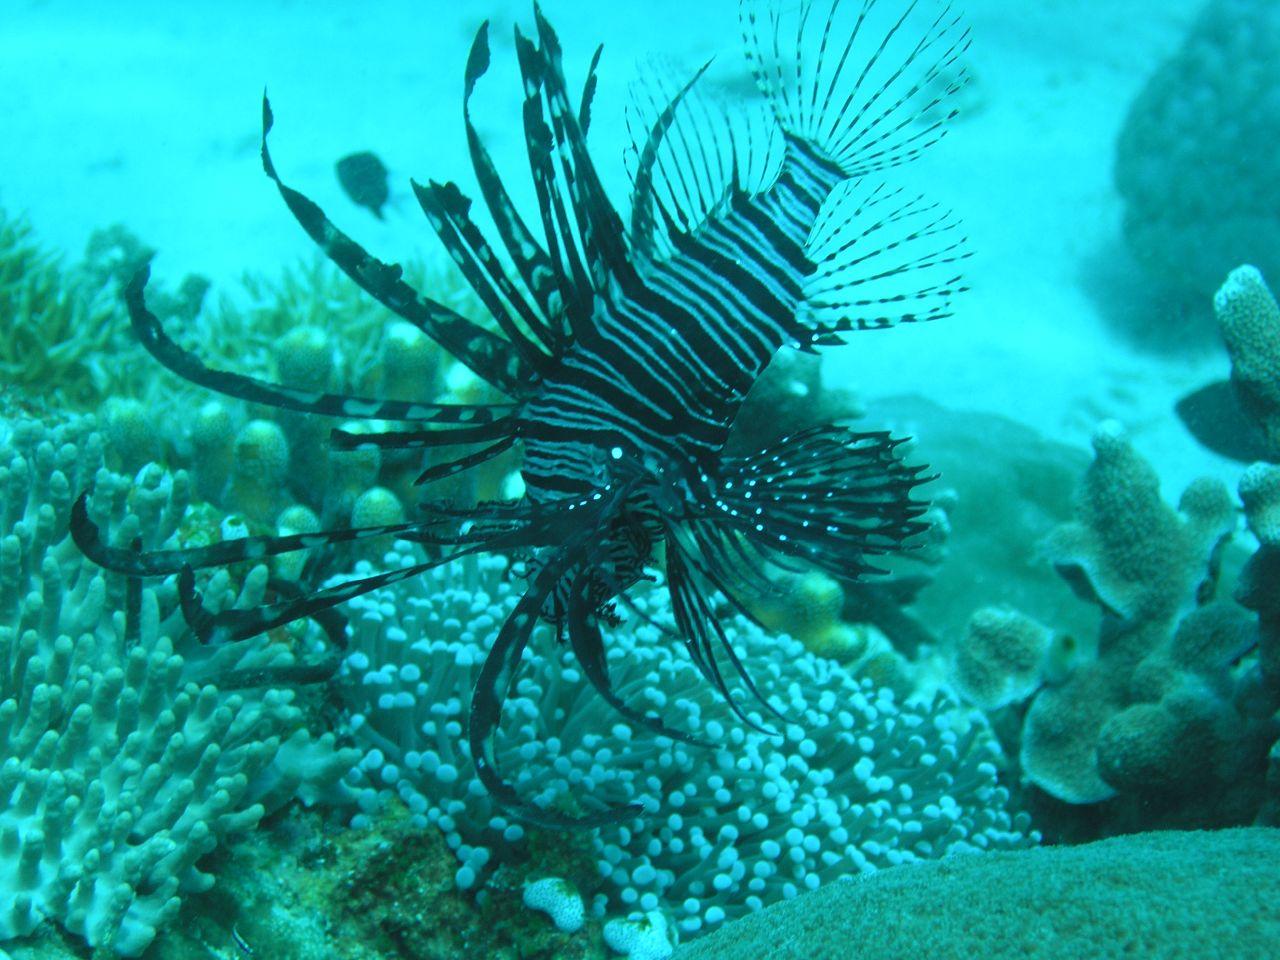 More lionfish